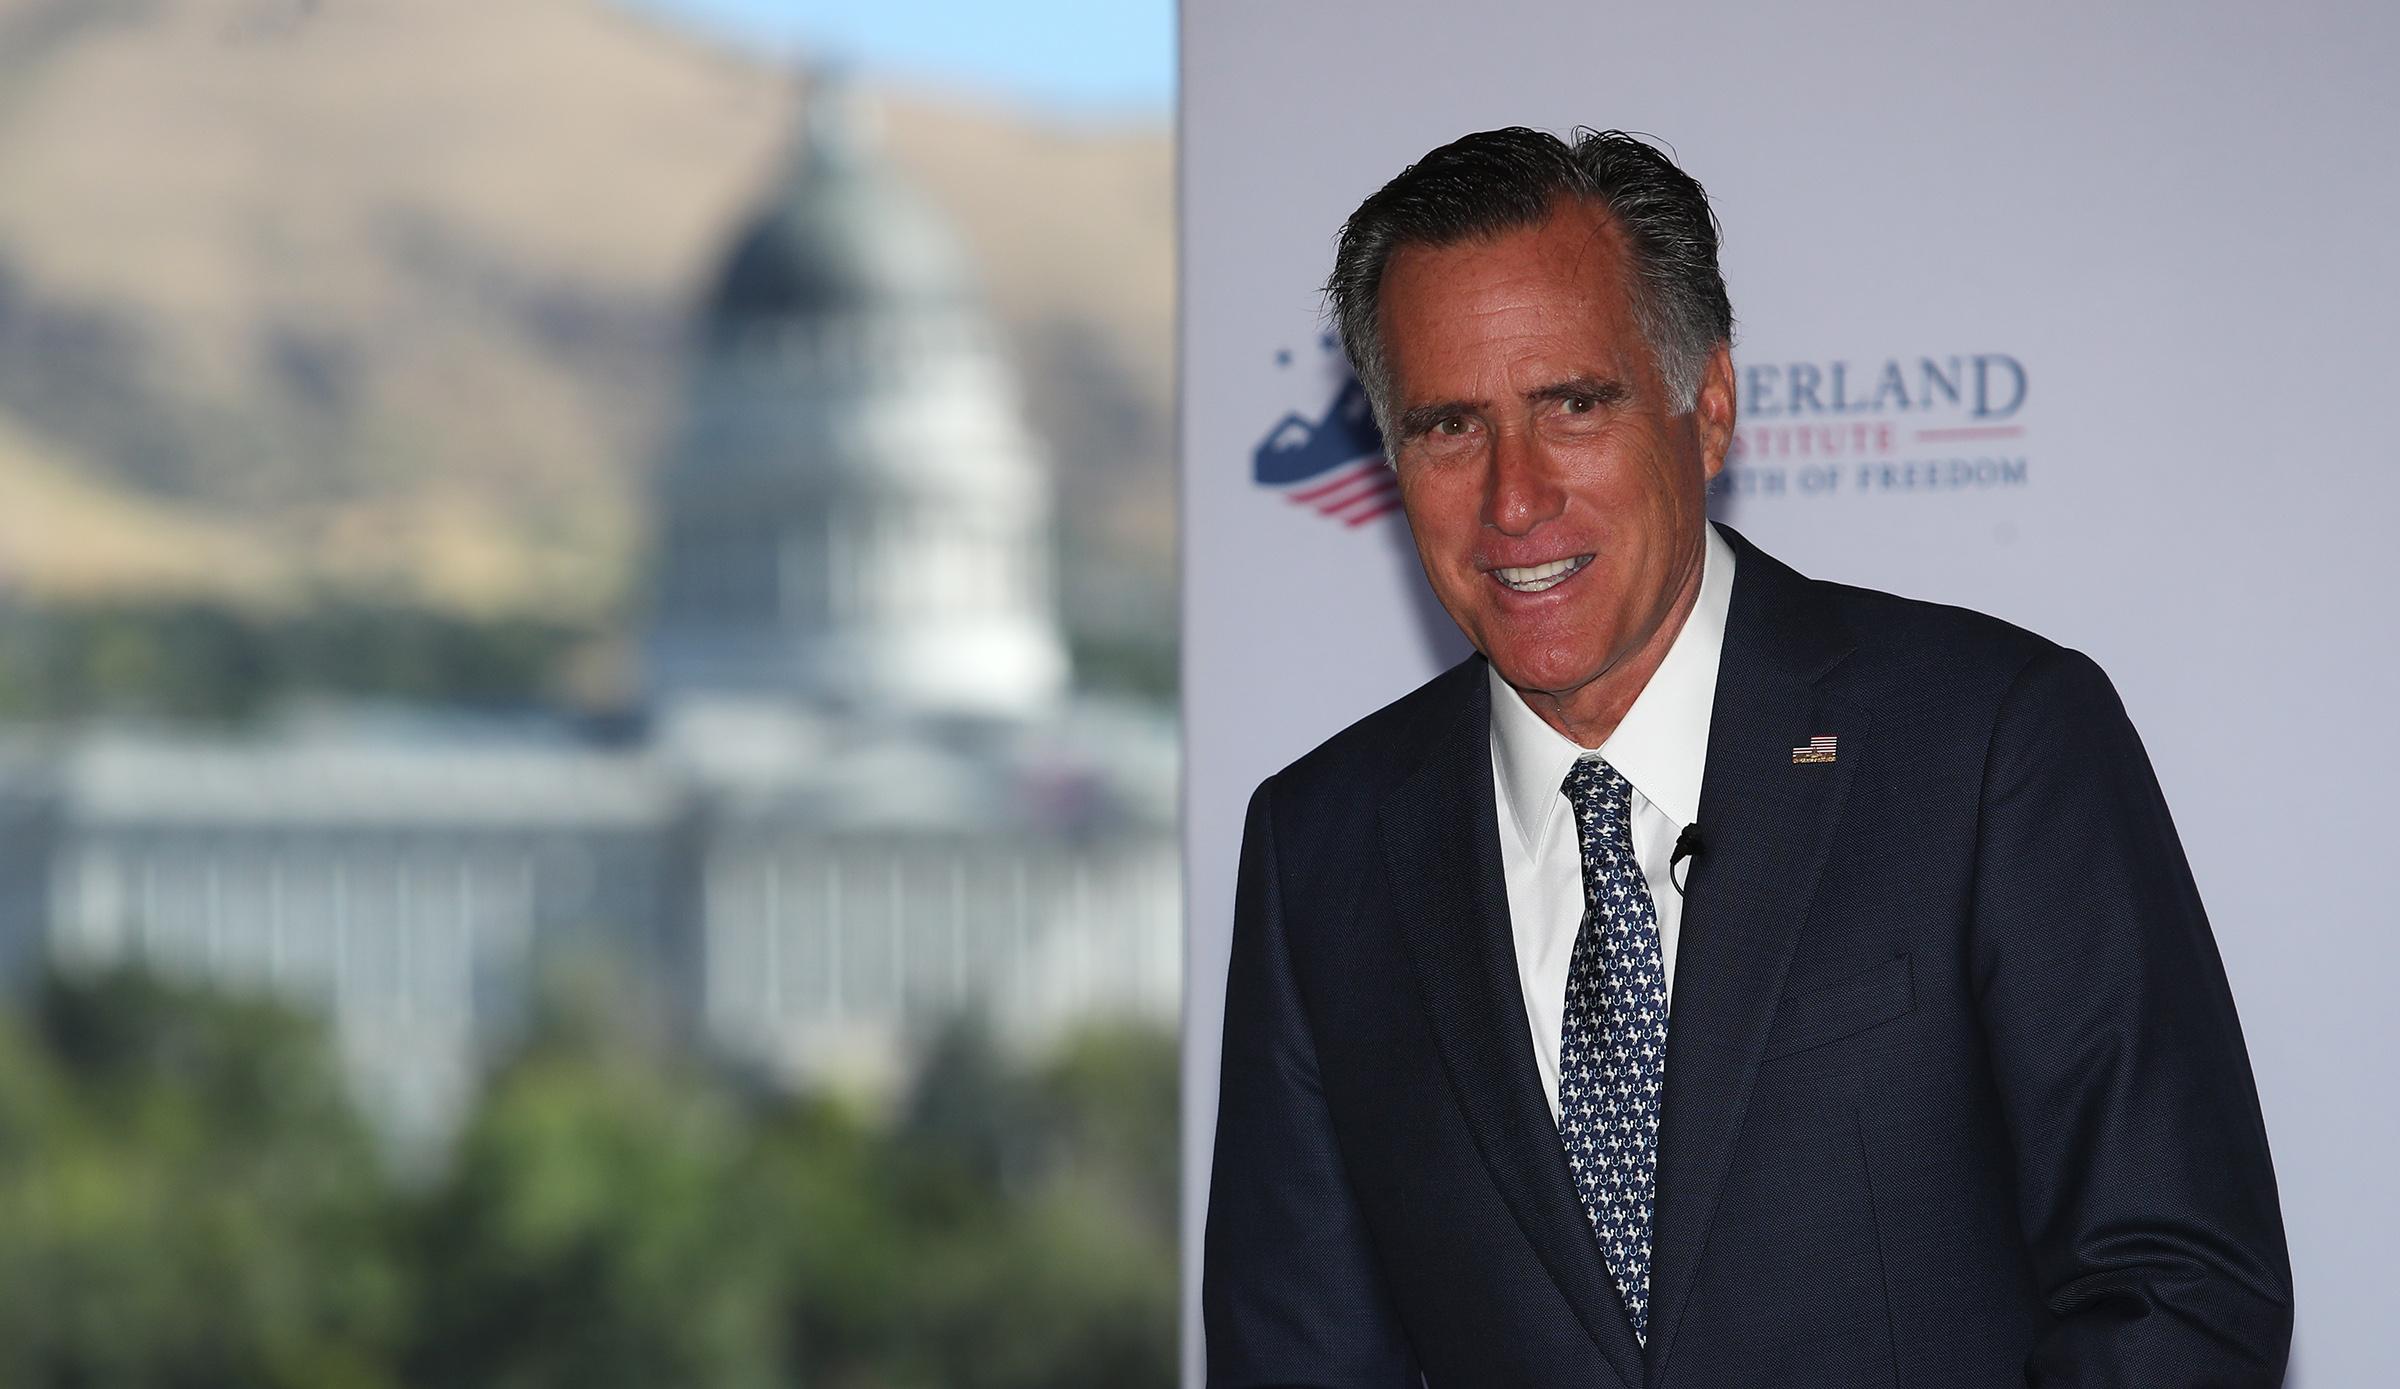 FILE - Sen. Mitt Romney, R-Utah, speaks at the Sutherland Institute in Salt Lake City on Monday, Aug. 19, 2019.